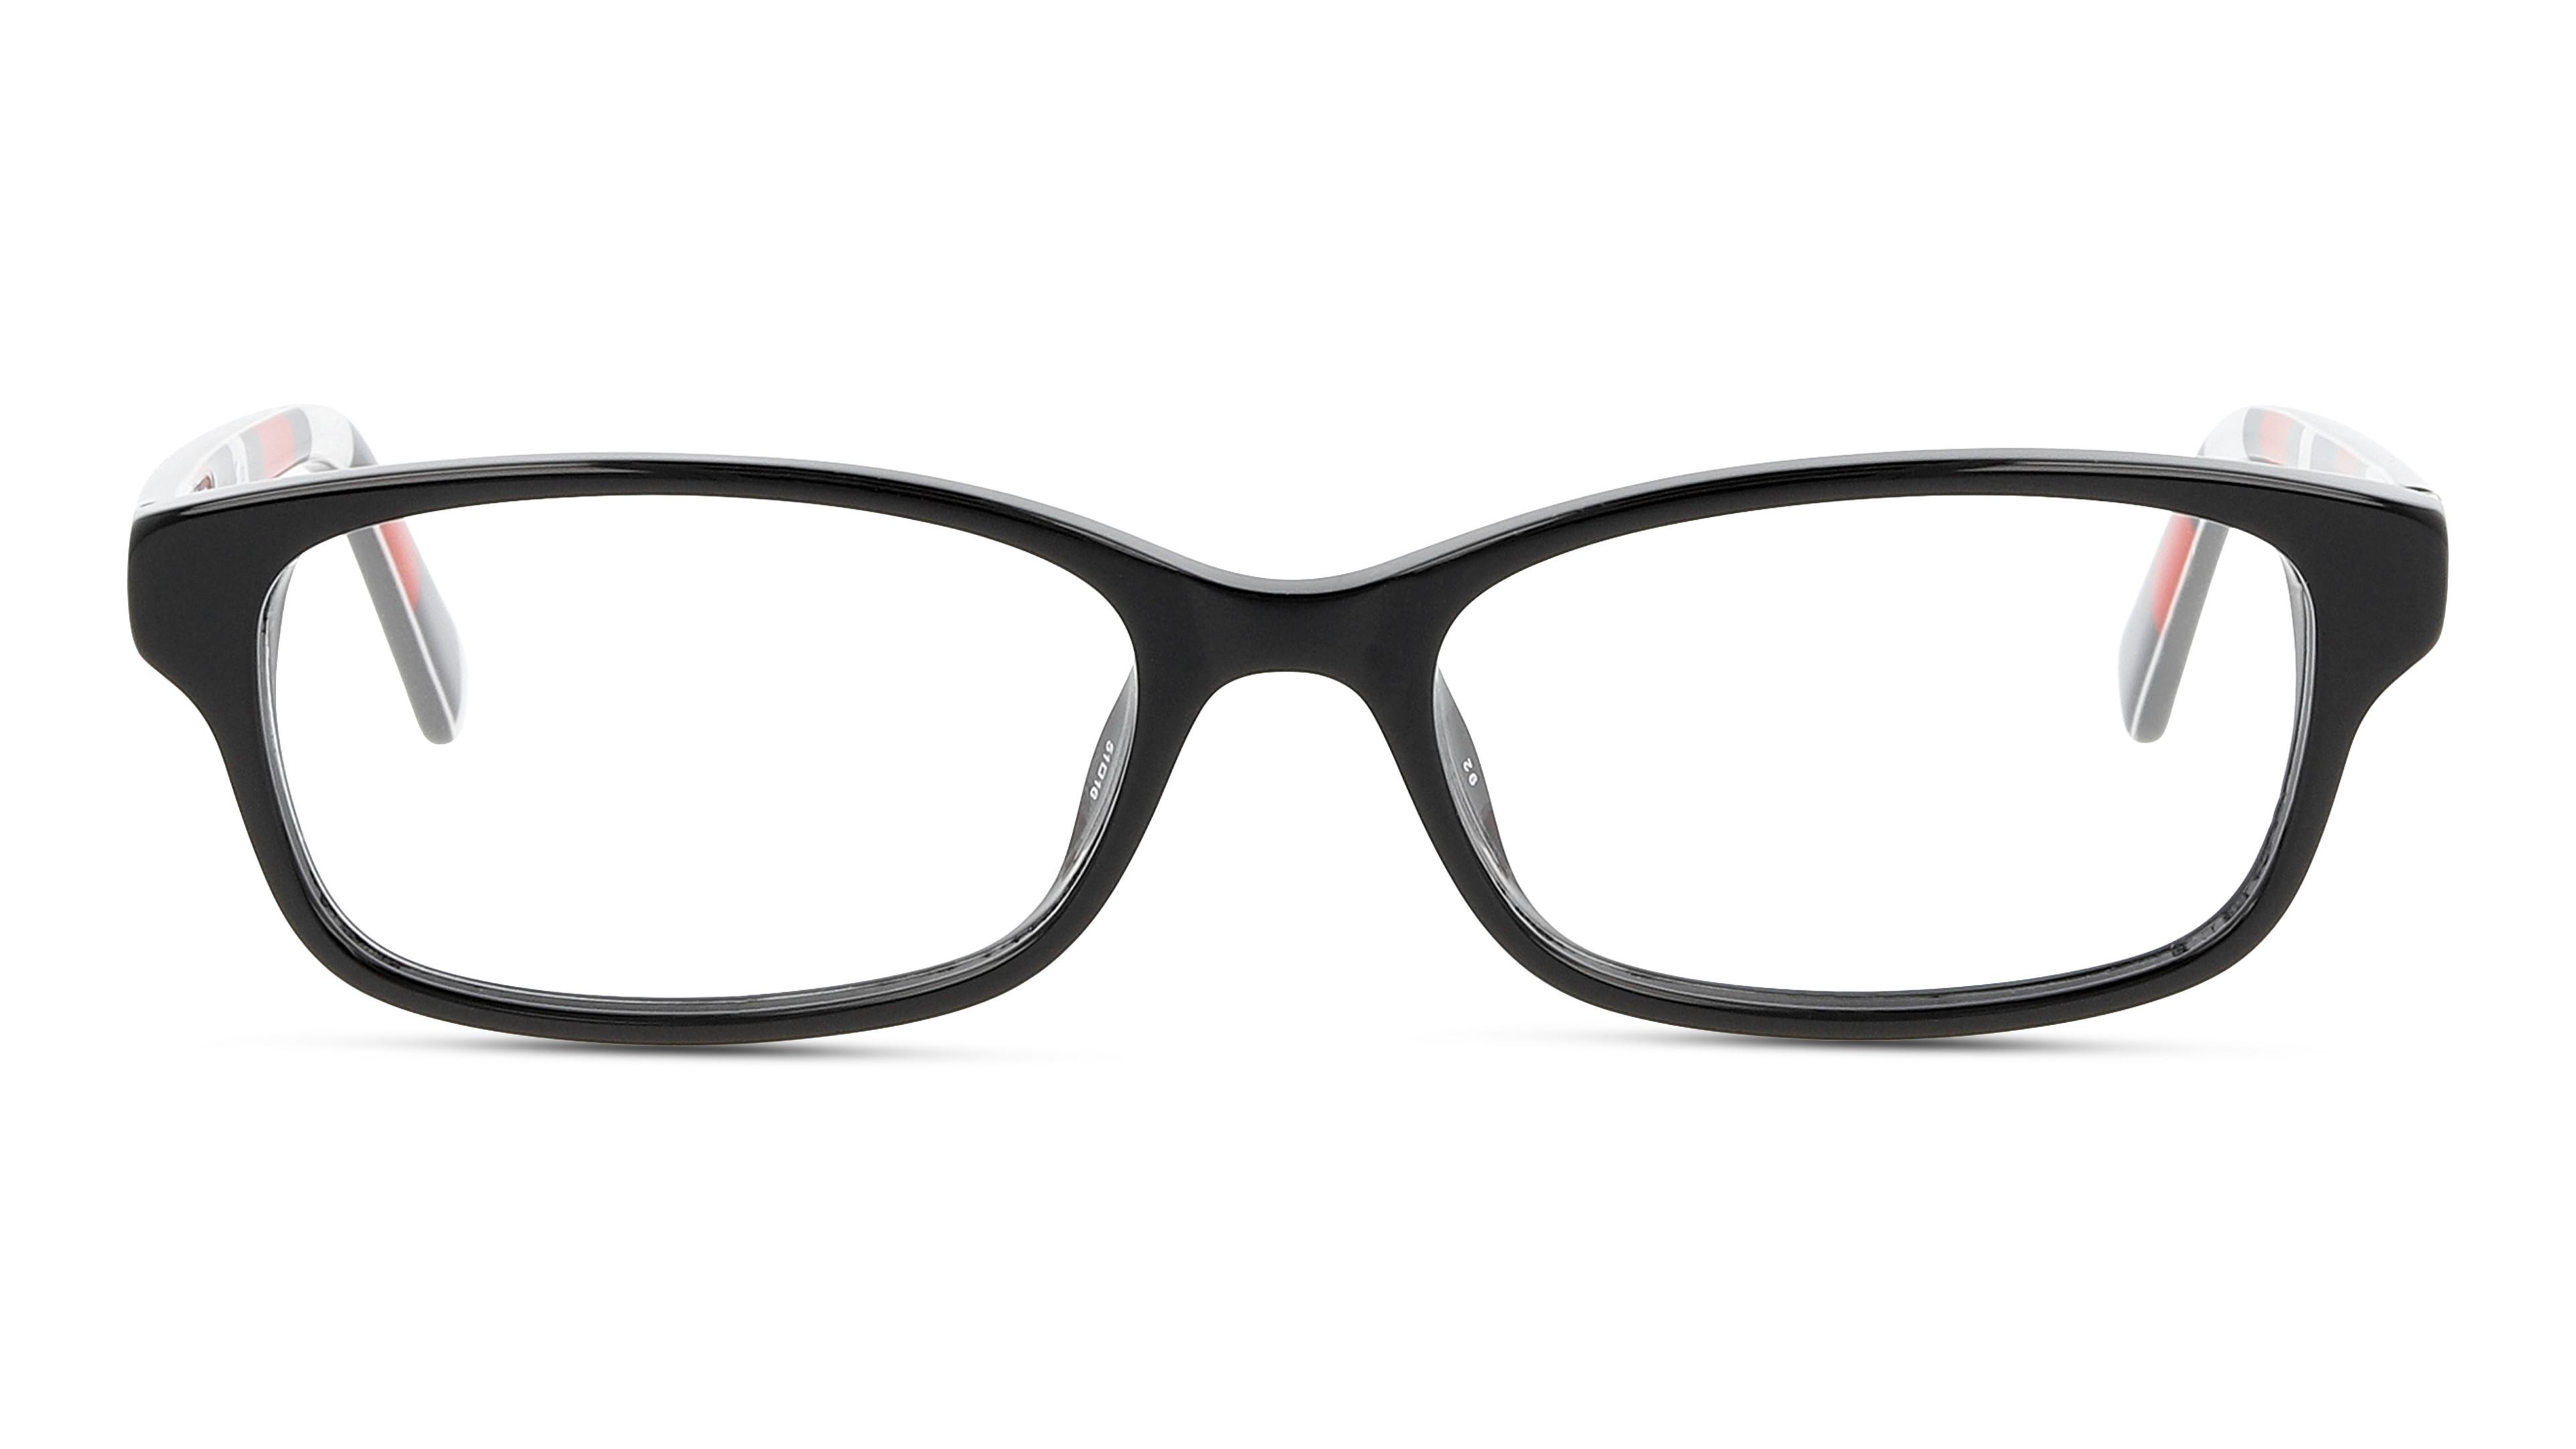 716736196183-front-01-tommy-hilfiger-th-1685-eyewear-black%20crop